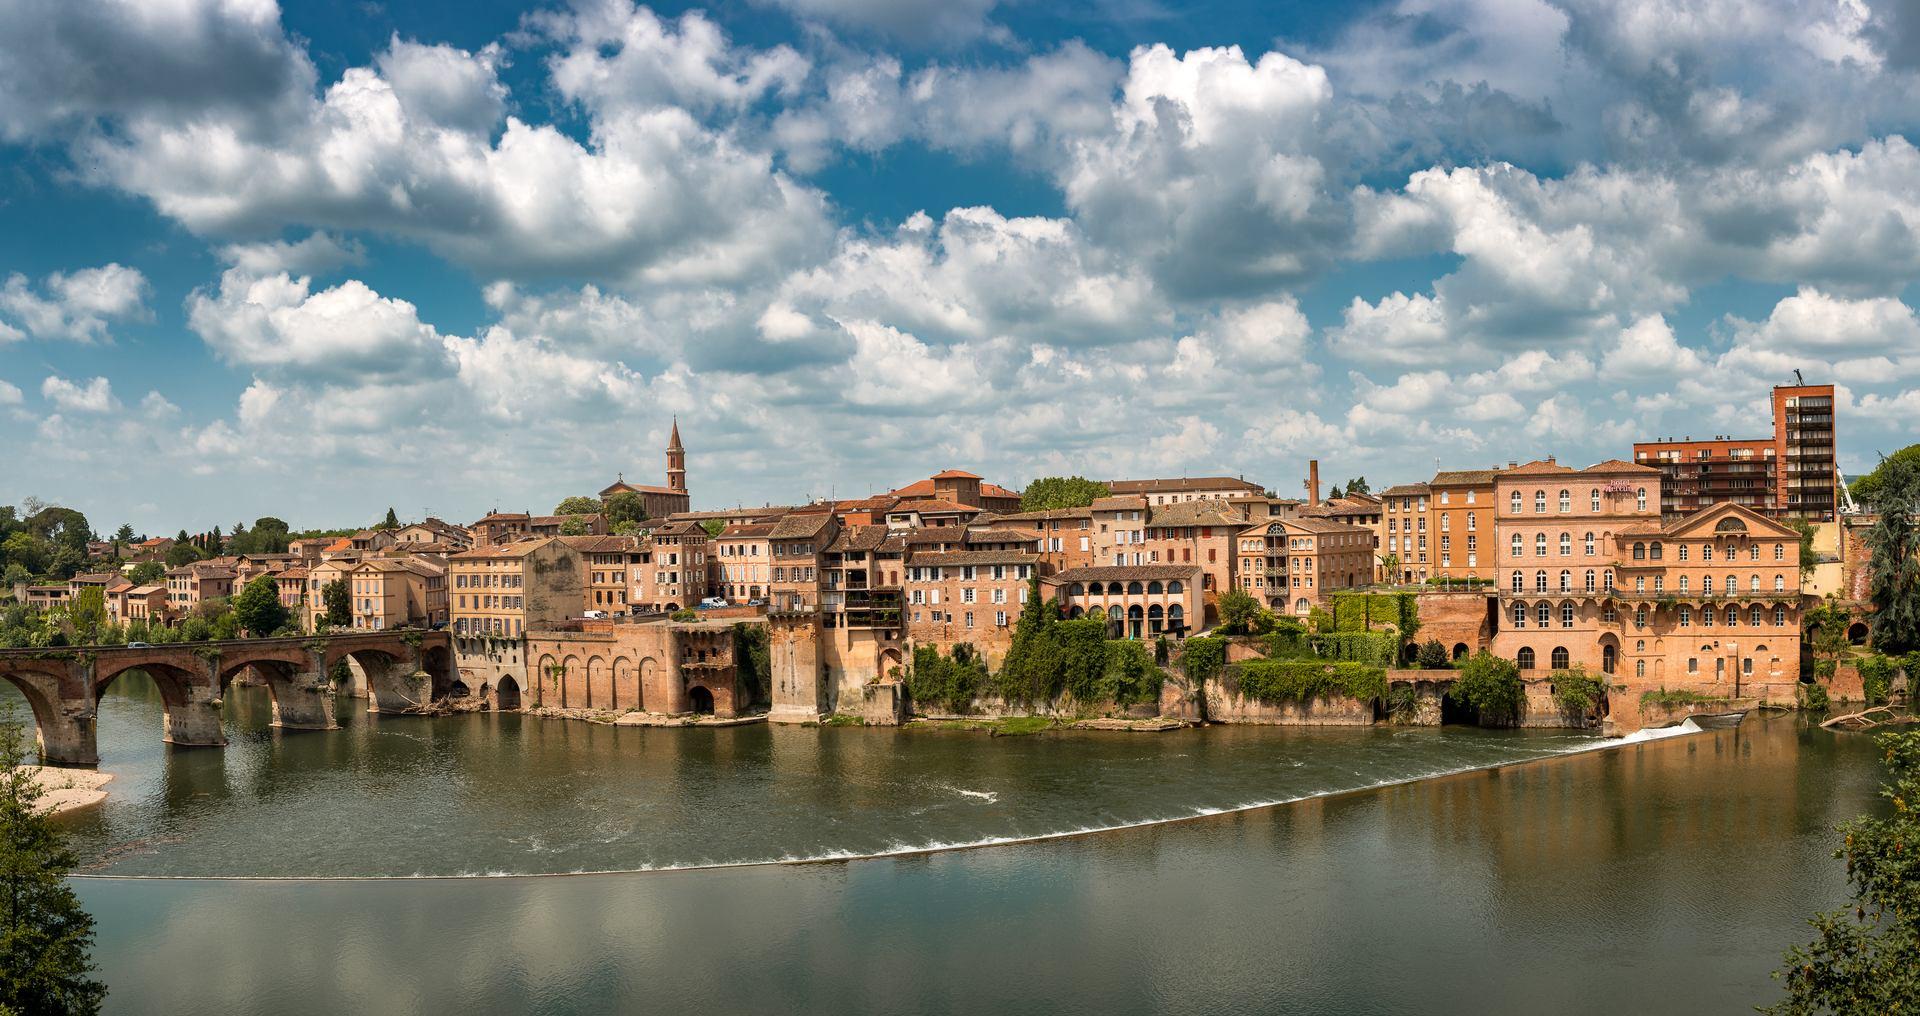 stories/2019-11-05-amazing-provence/albi